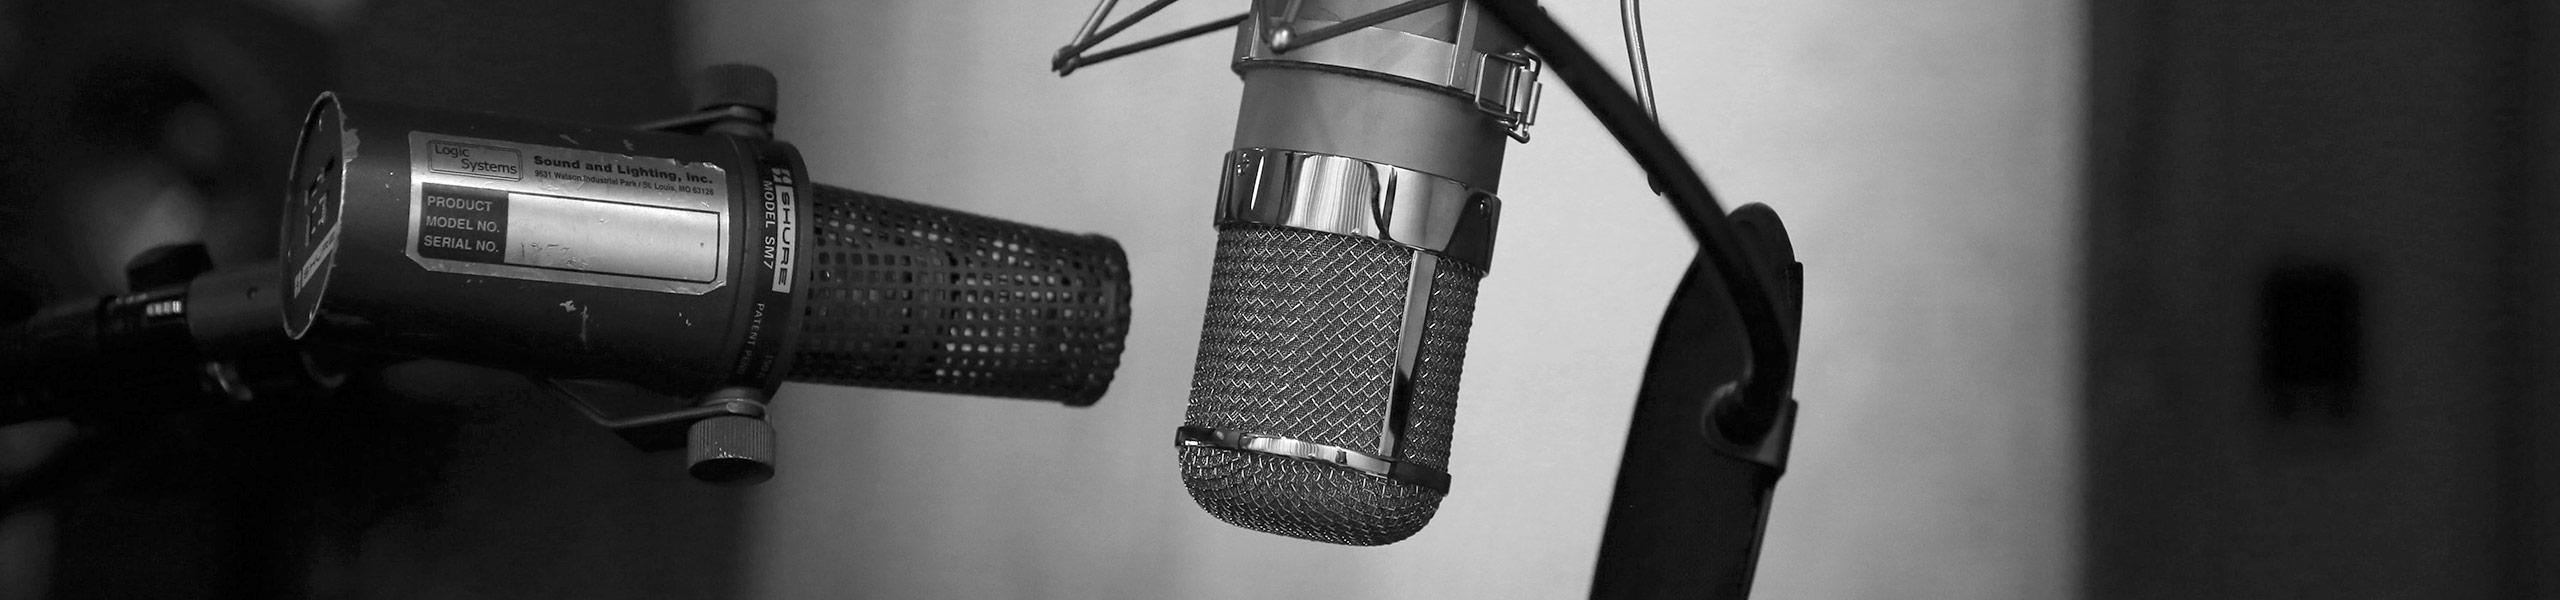 [photo of microphones]